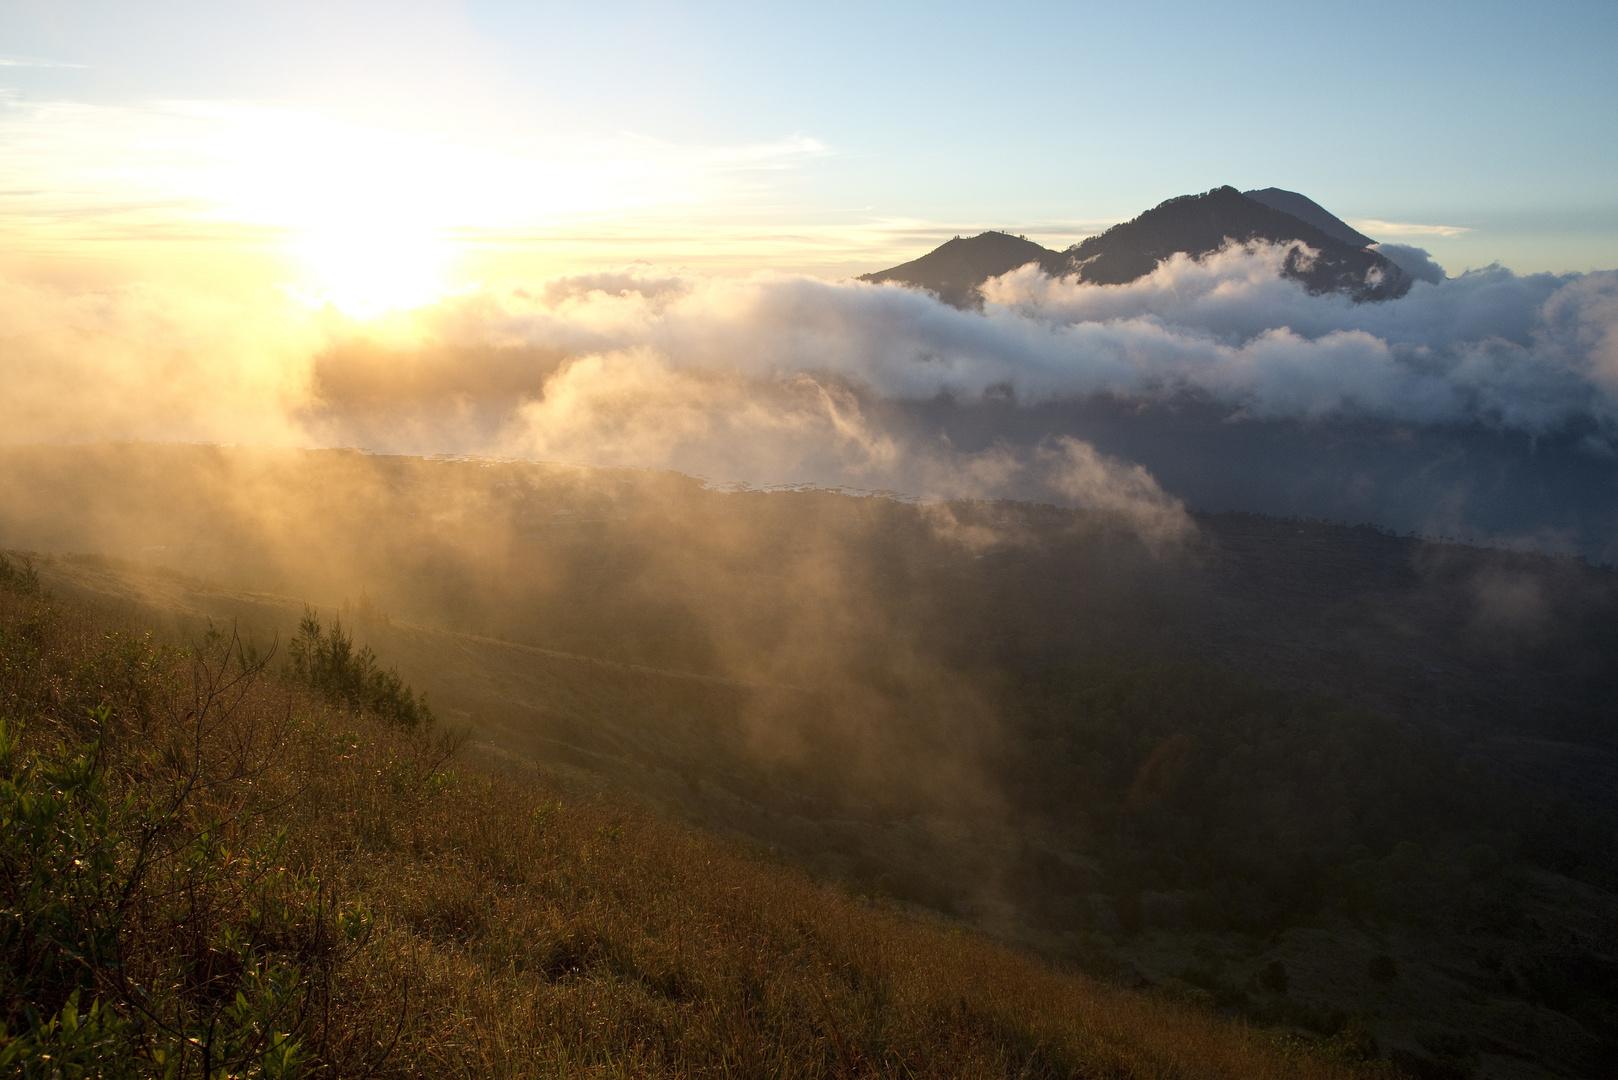 ...Mount Batur [ I ]